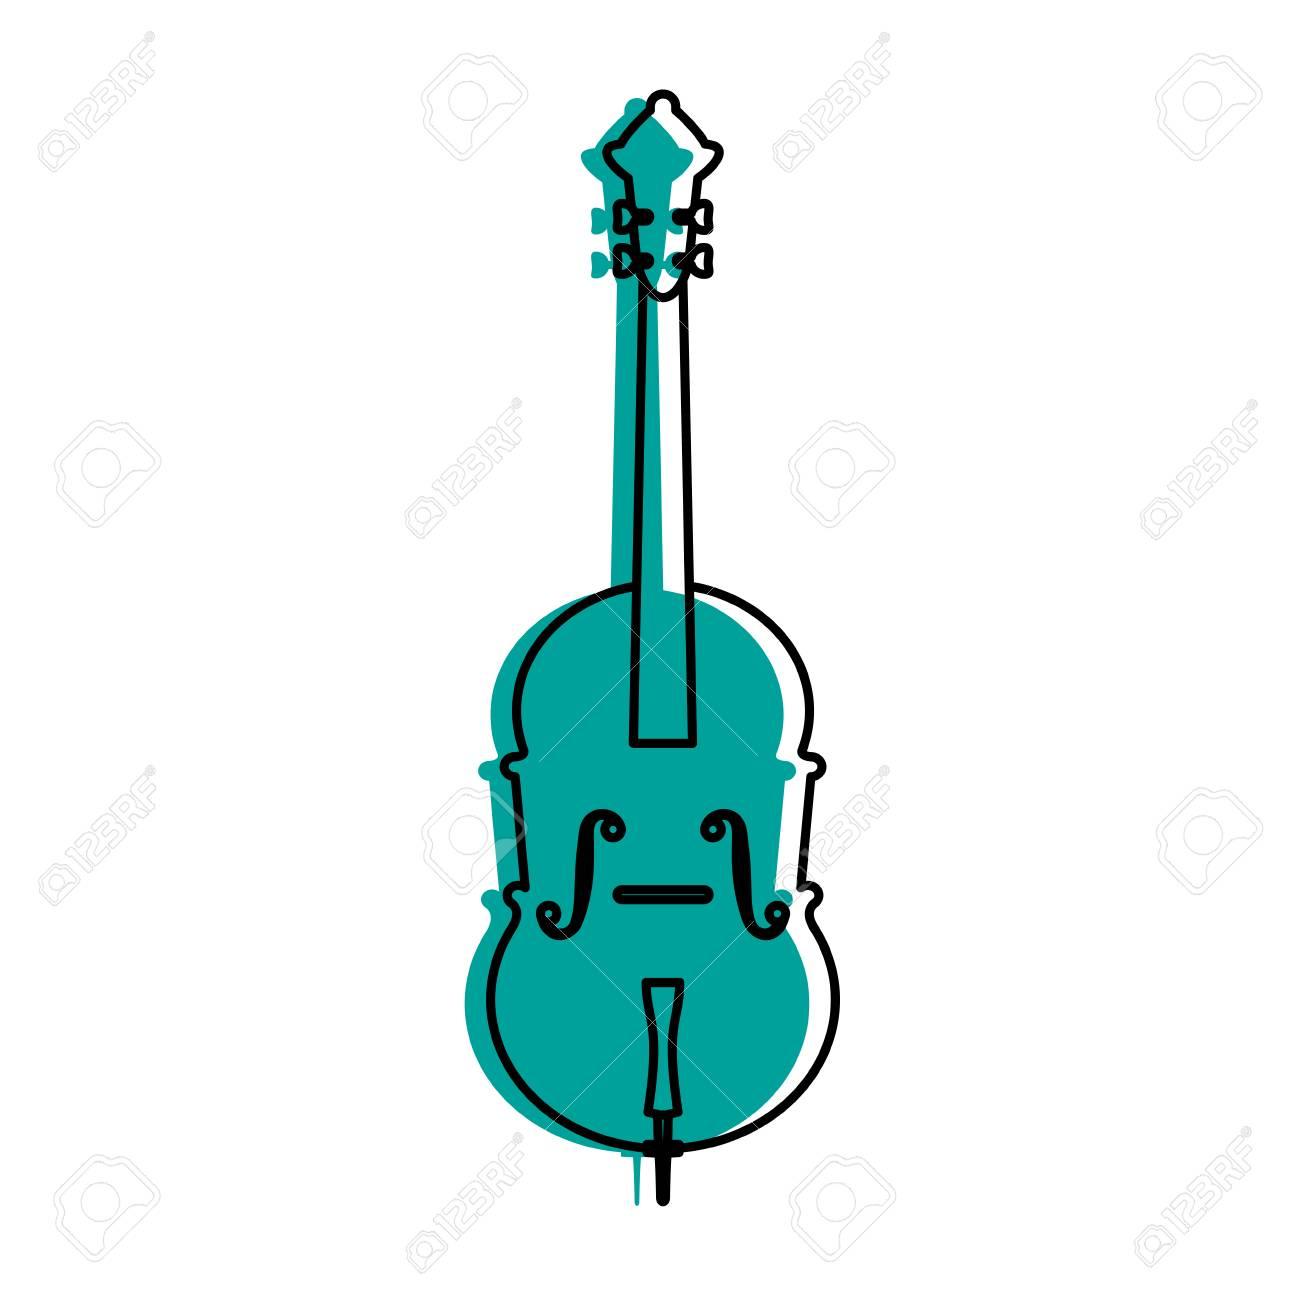 Cello Musical Instrument Icon Image Vector Illustration Design Blue Color Stock